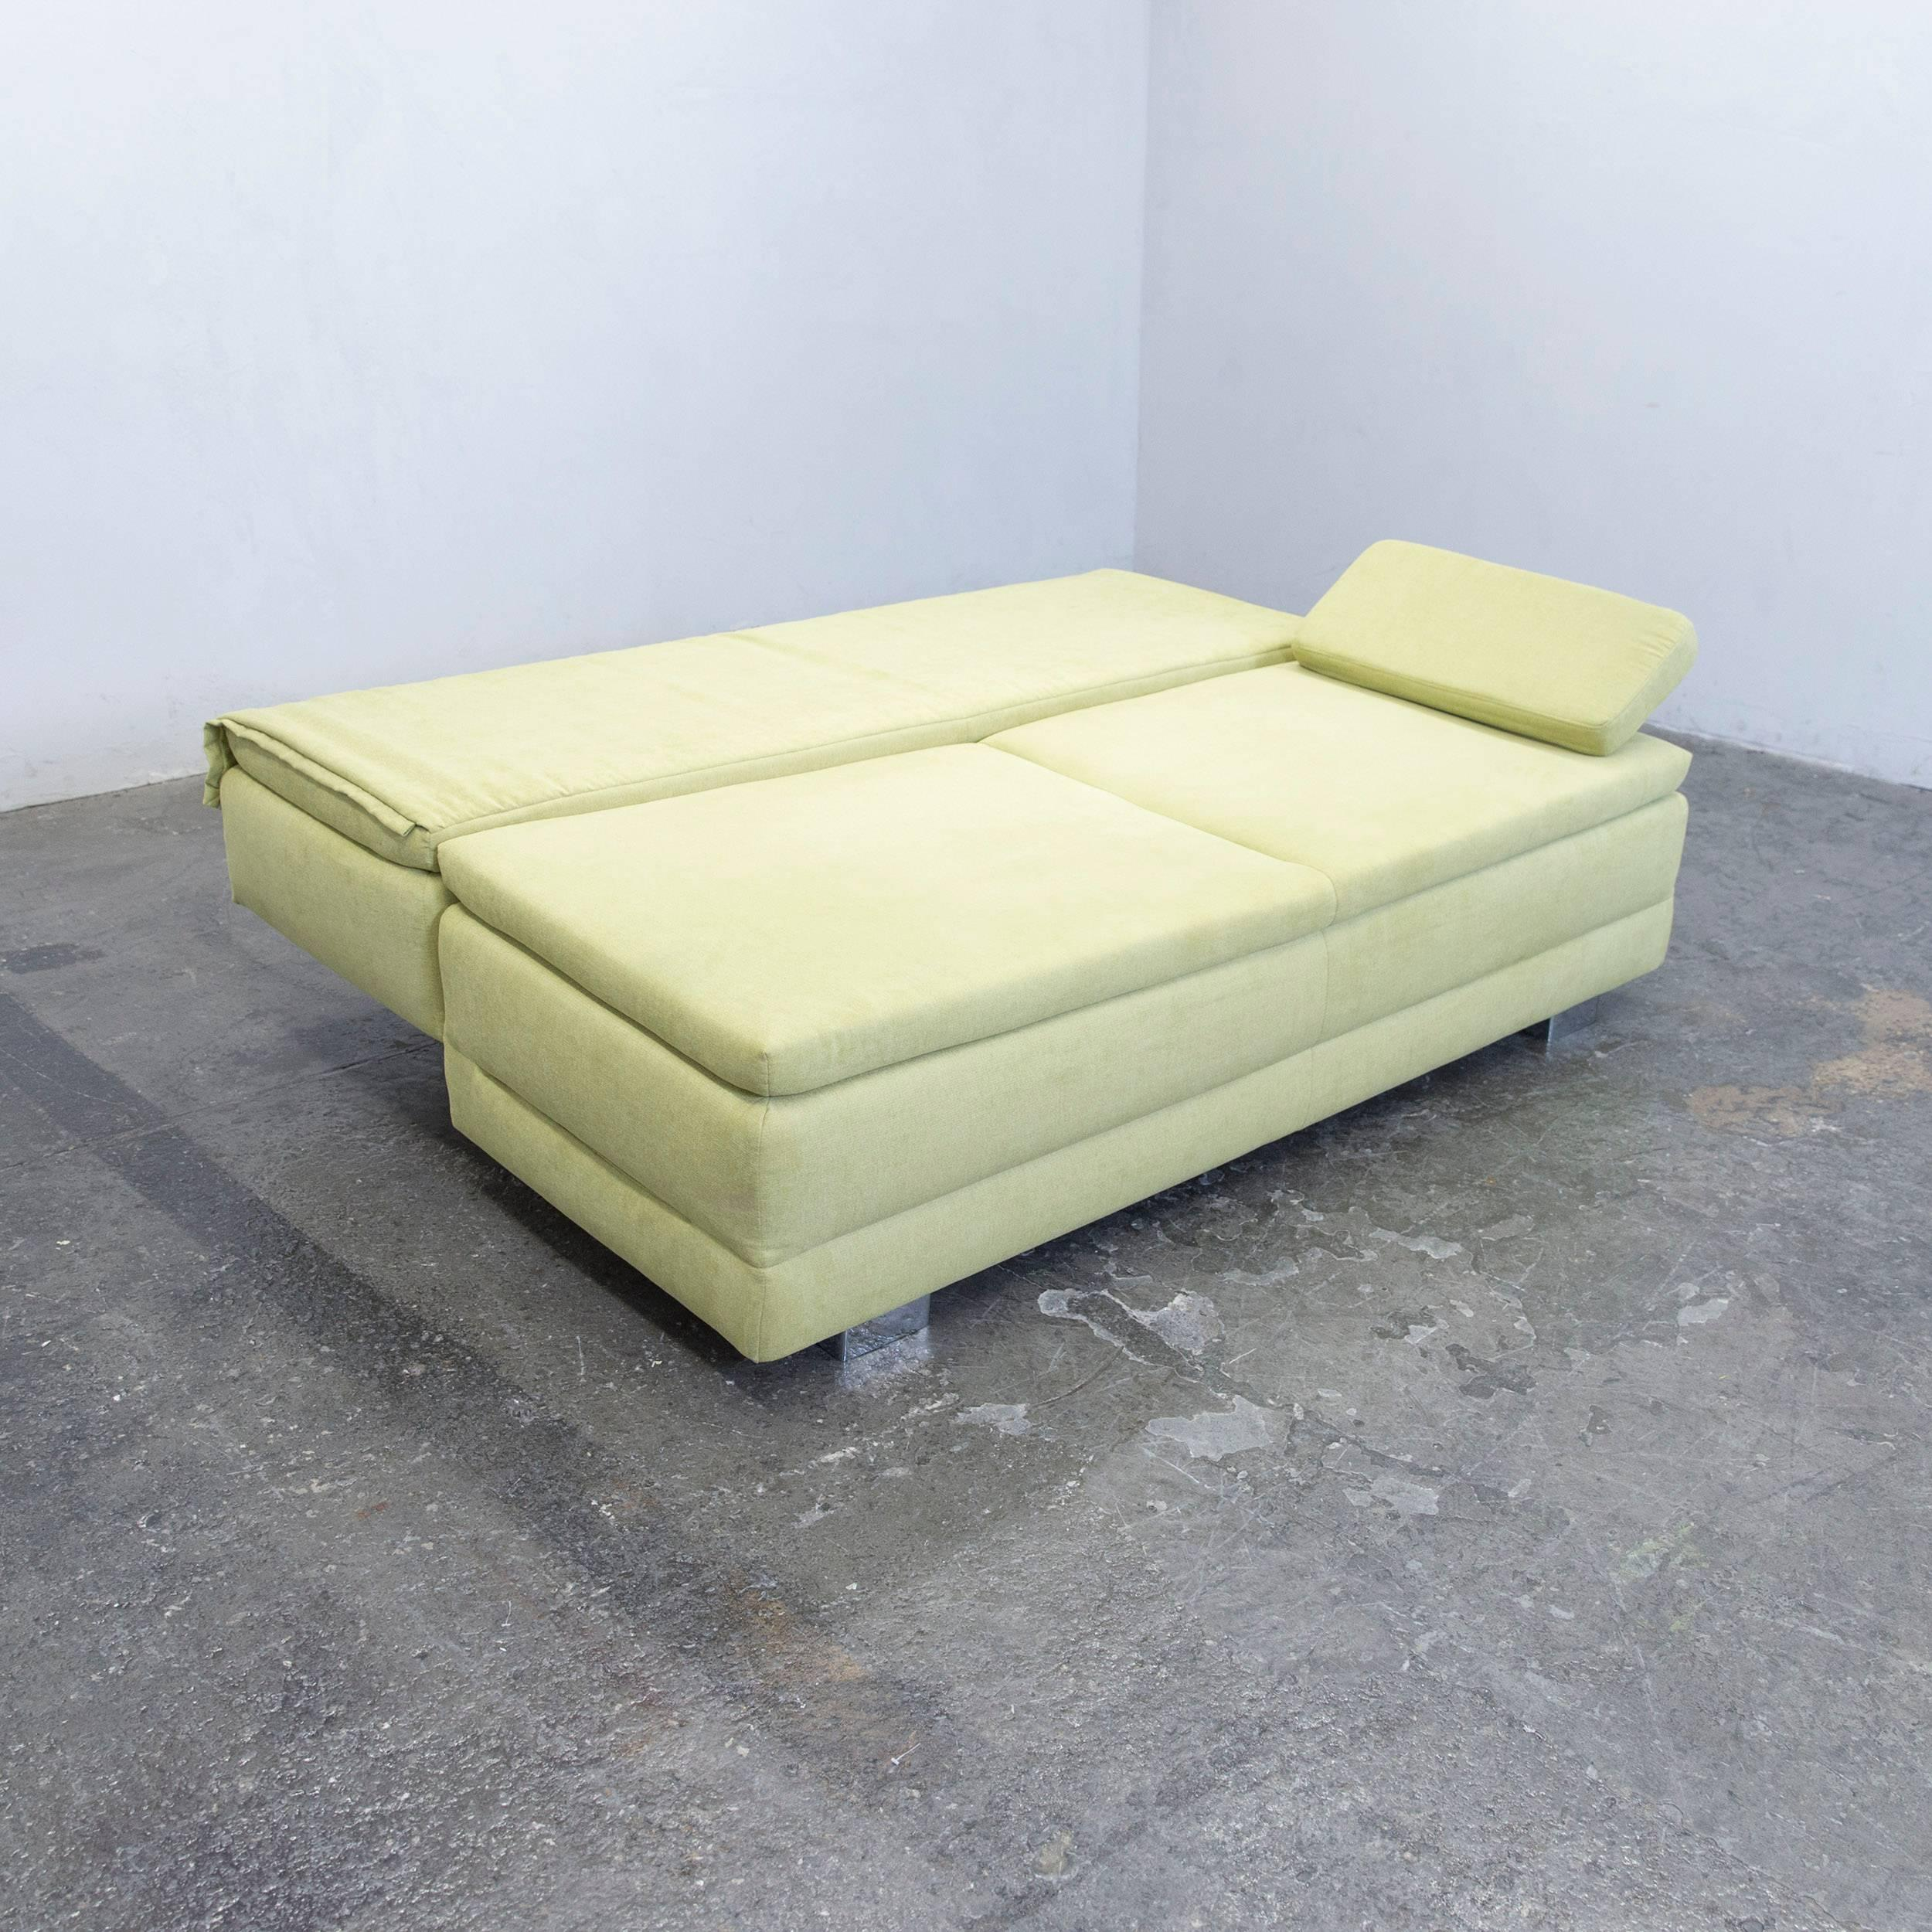 Großartig Schlafsofa Boxspring Sammlung Von Designer Sleep Sofa Fabric Green Three-seat Function